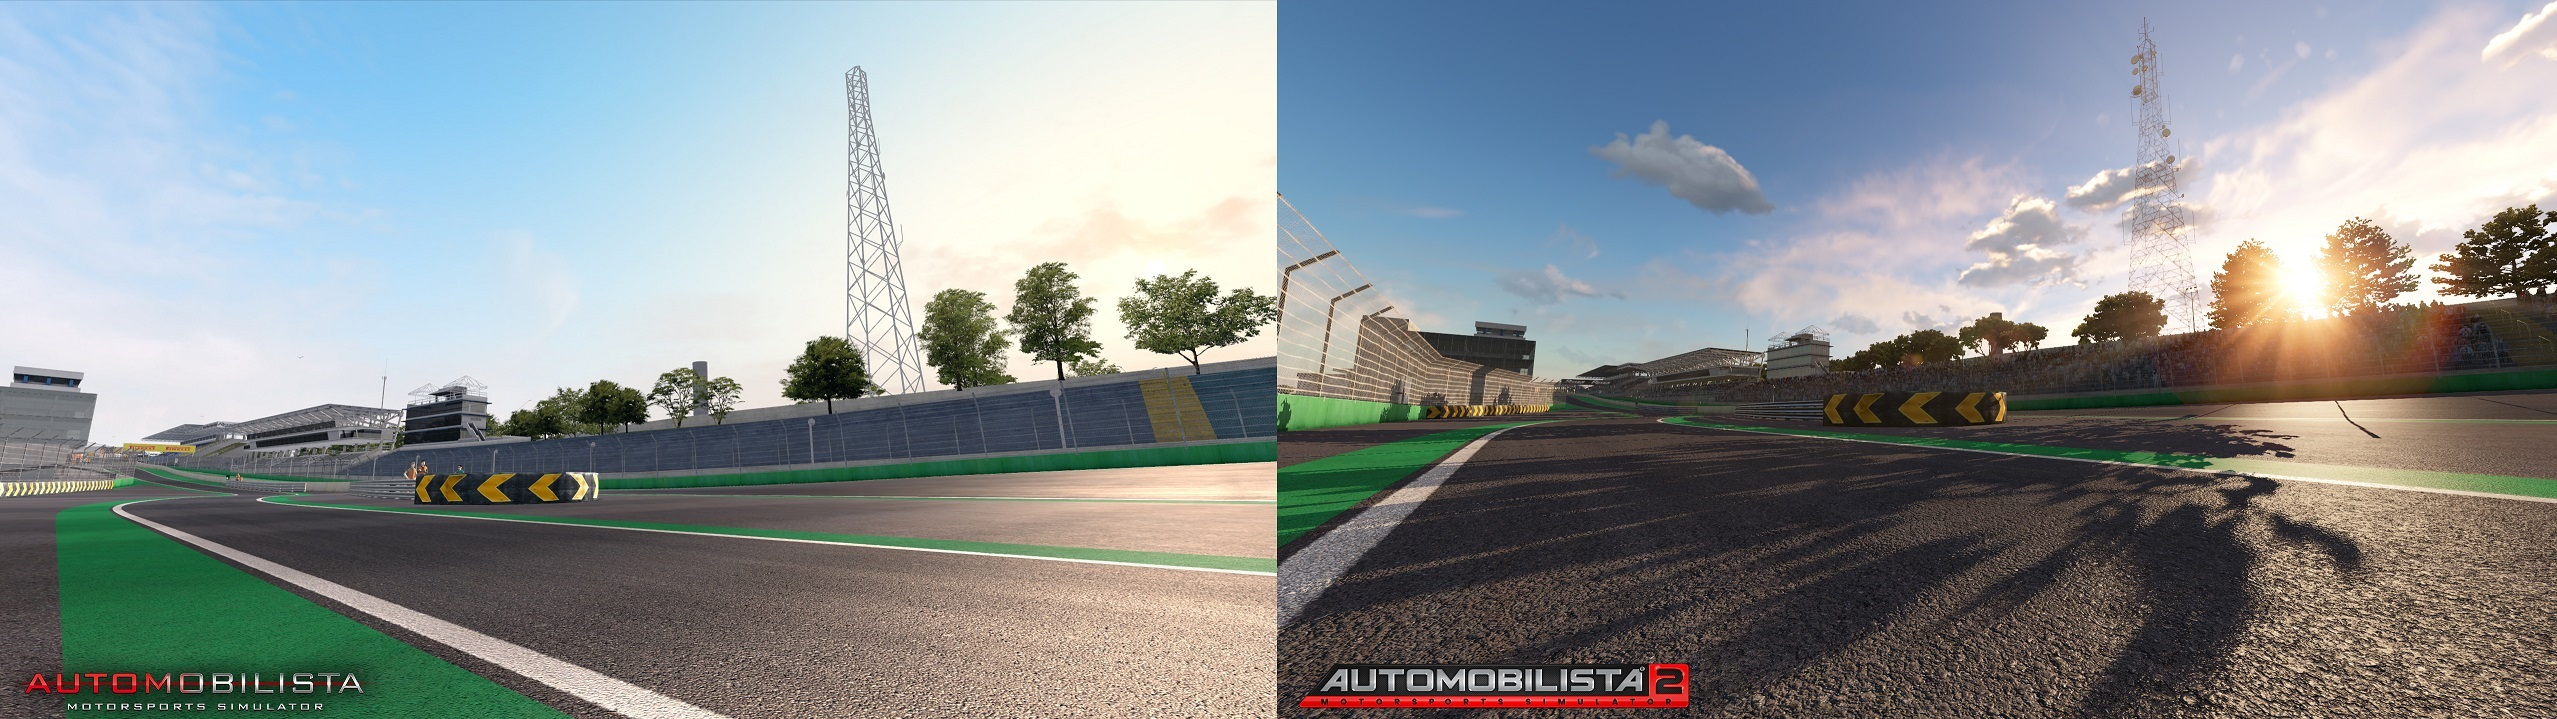 AMS 2 comparison b.jpg